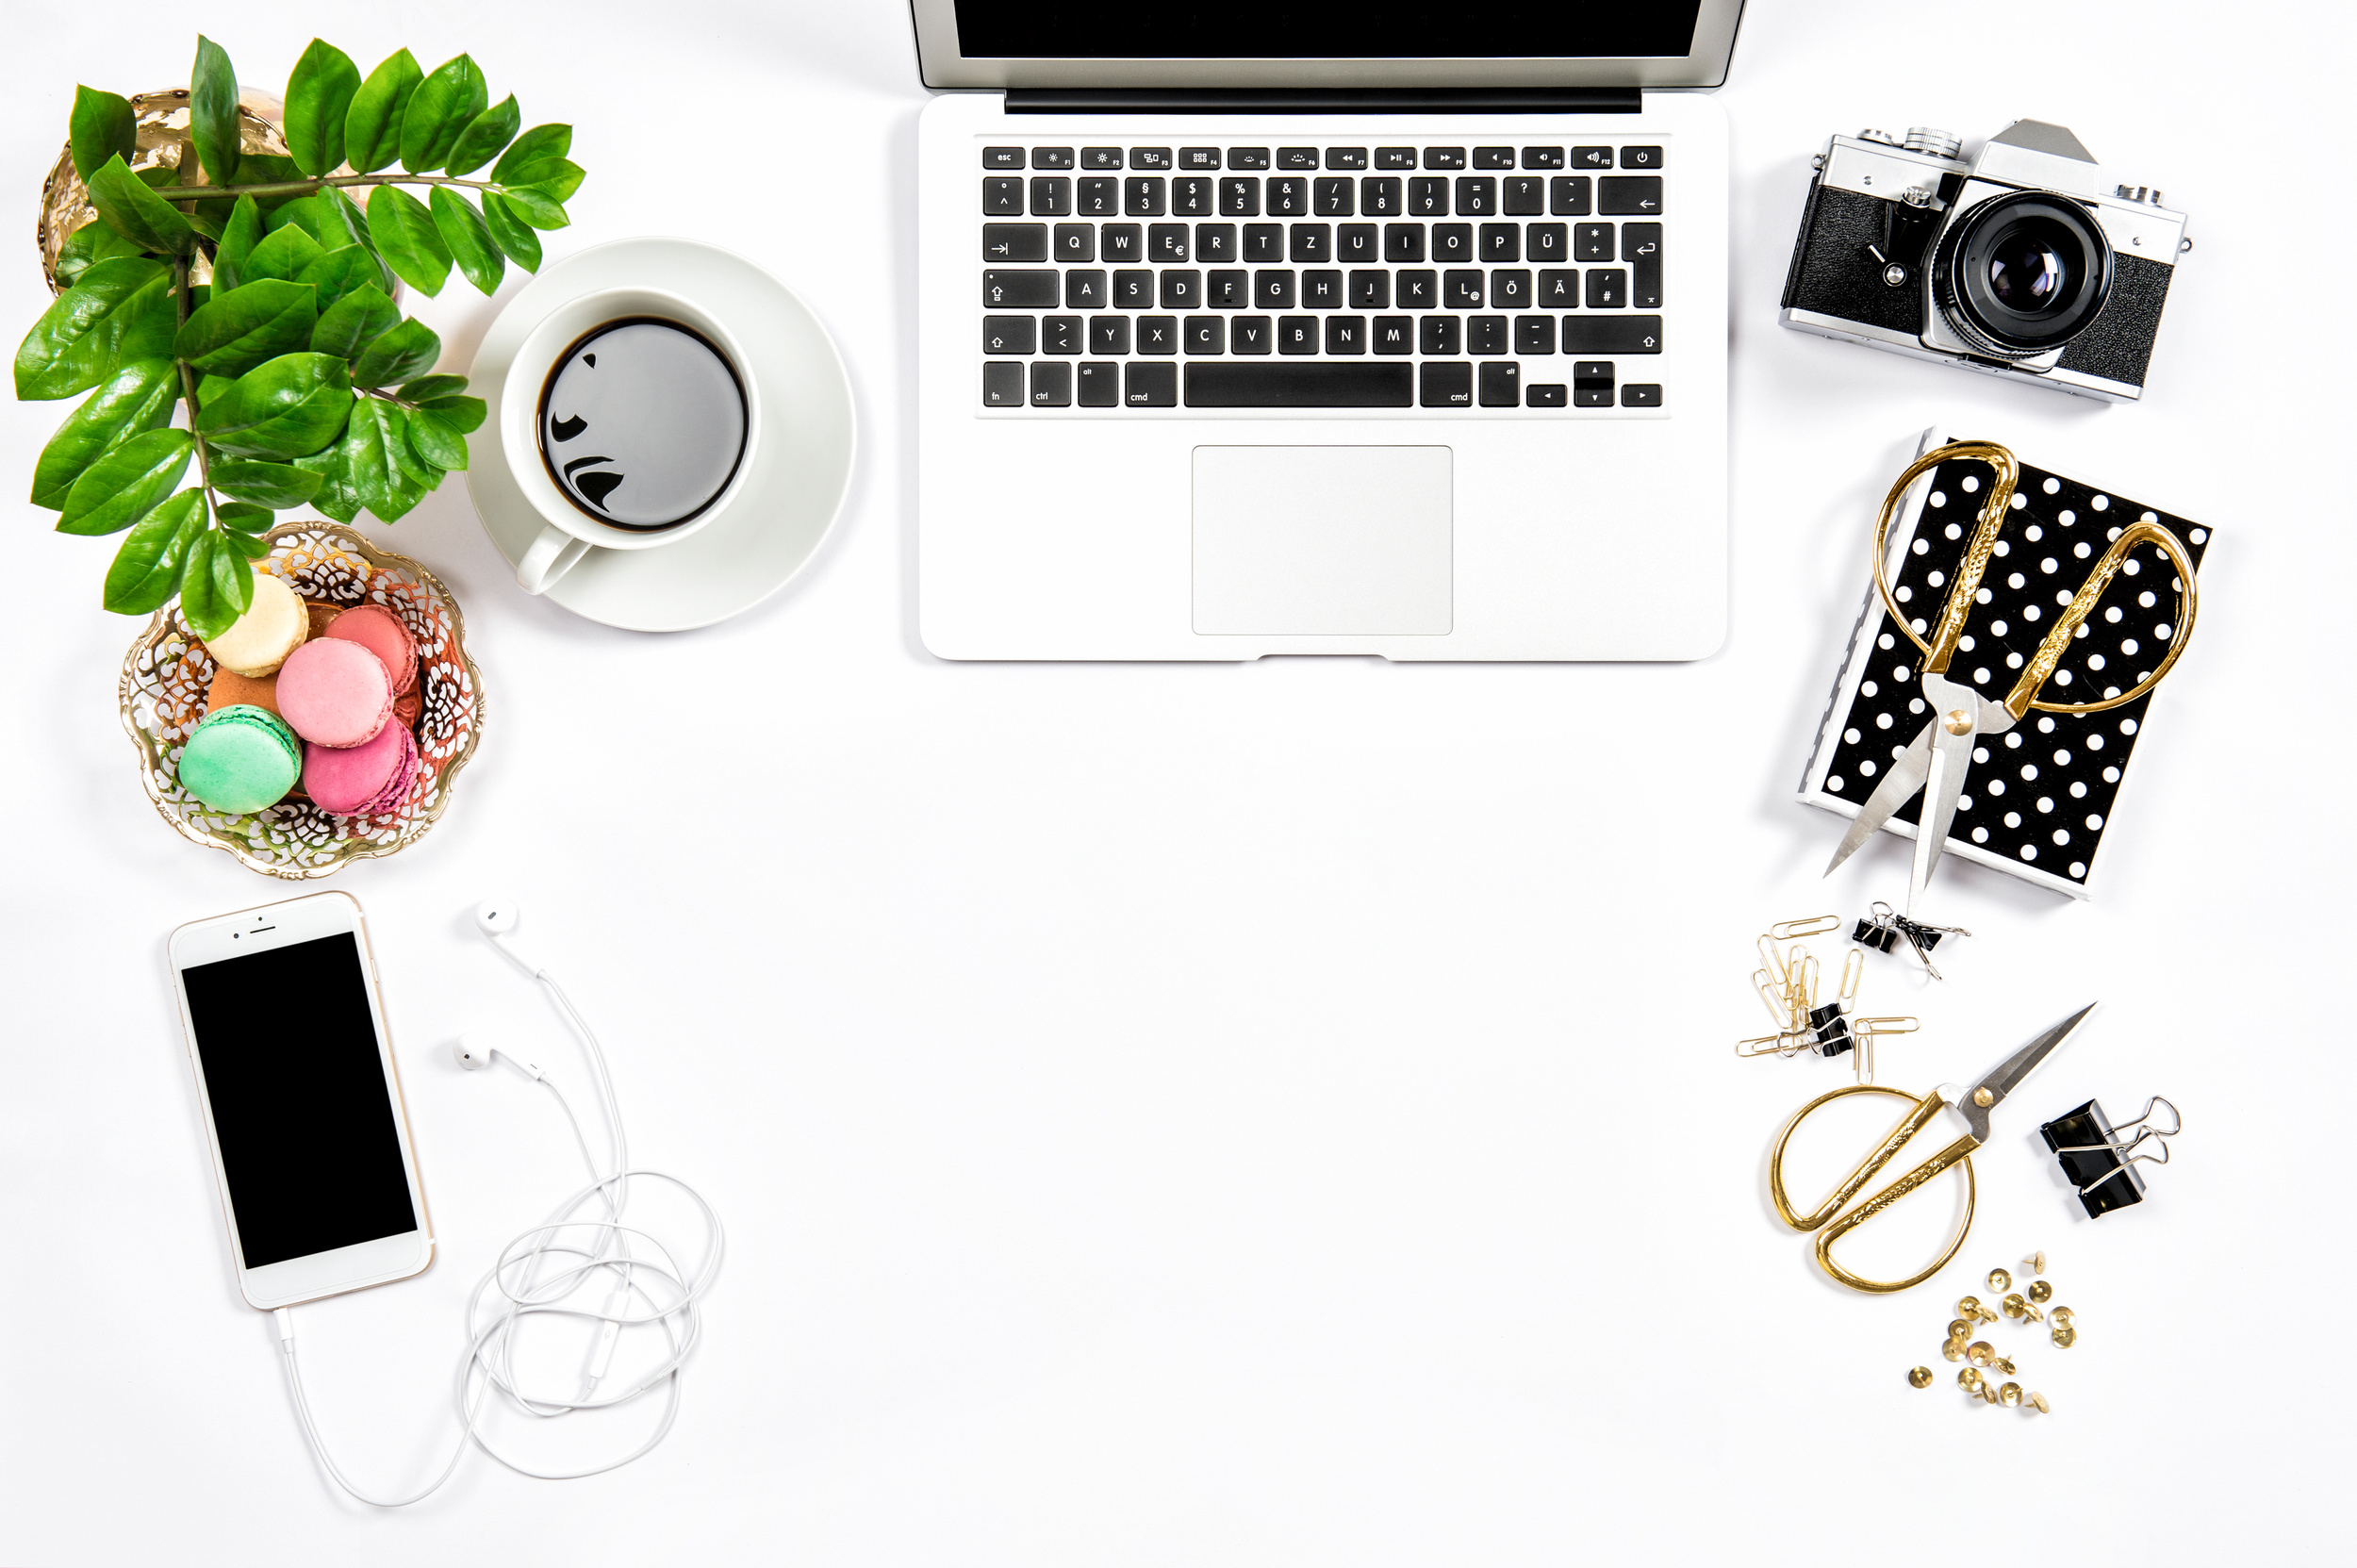 Online Consultation services